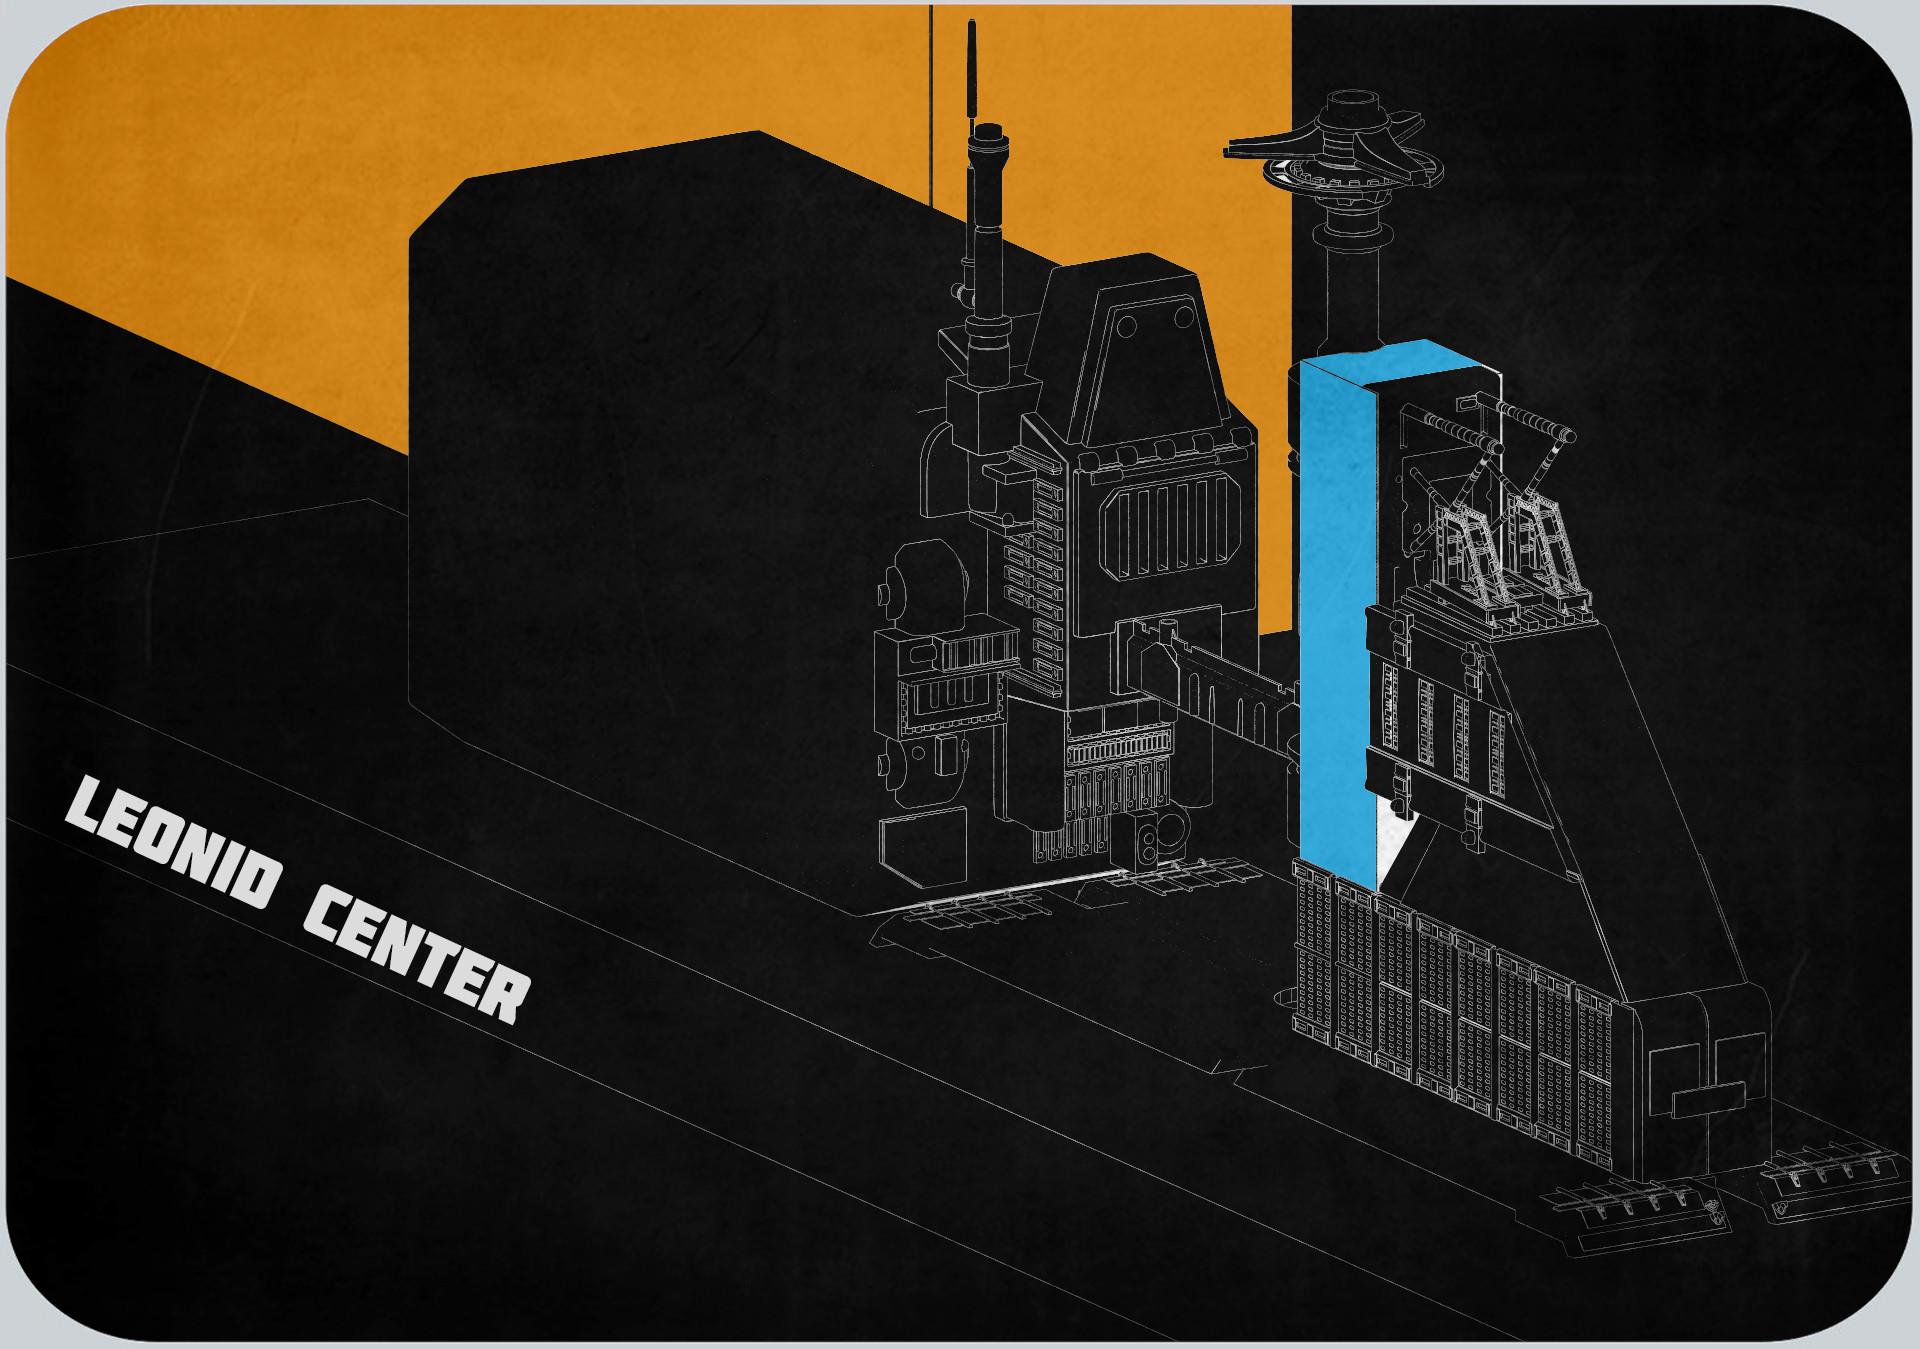 Ben nicholas sovietblueprint abstraction 02